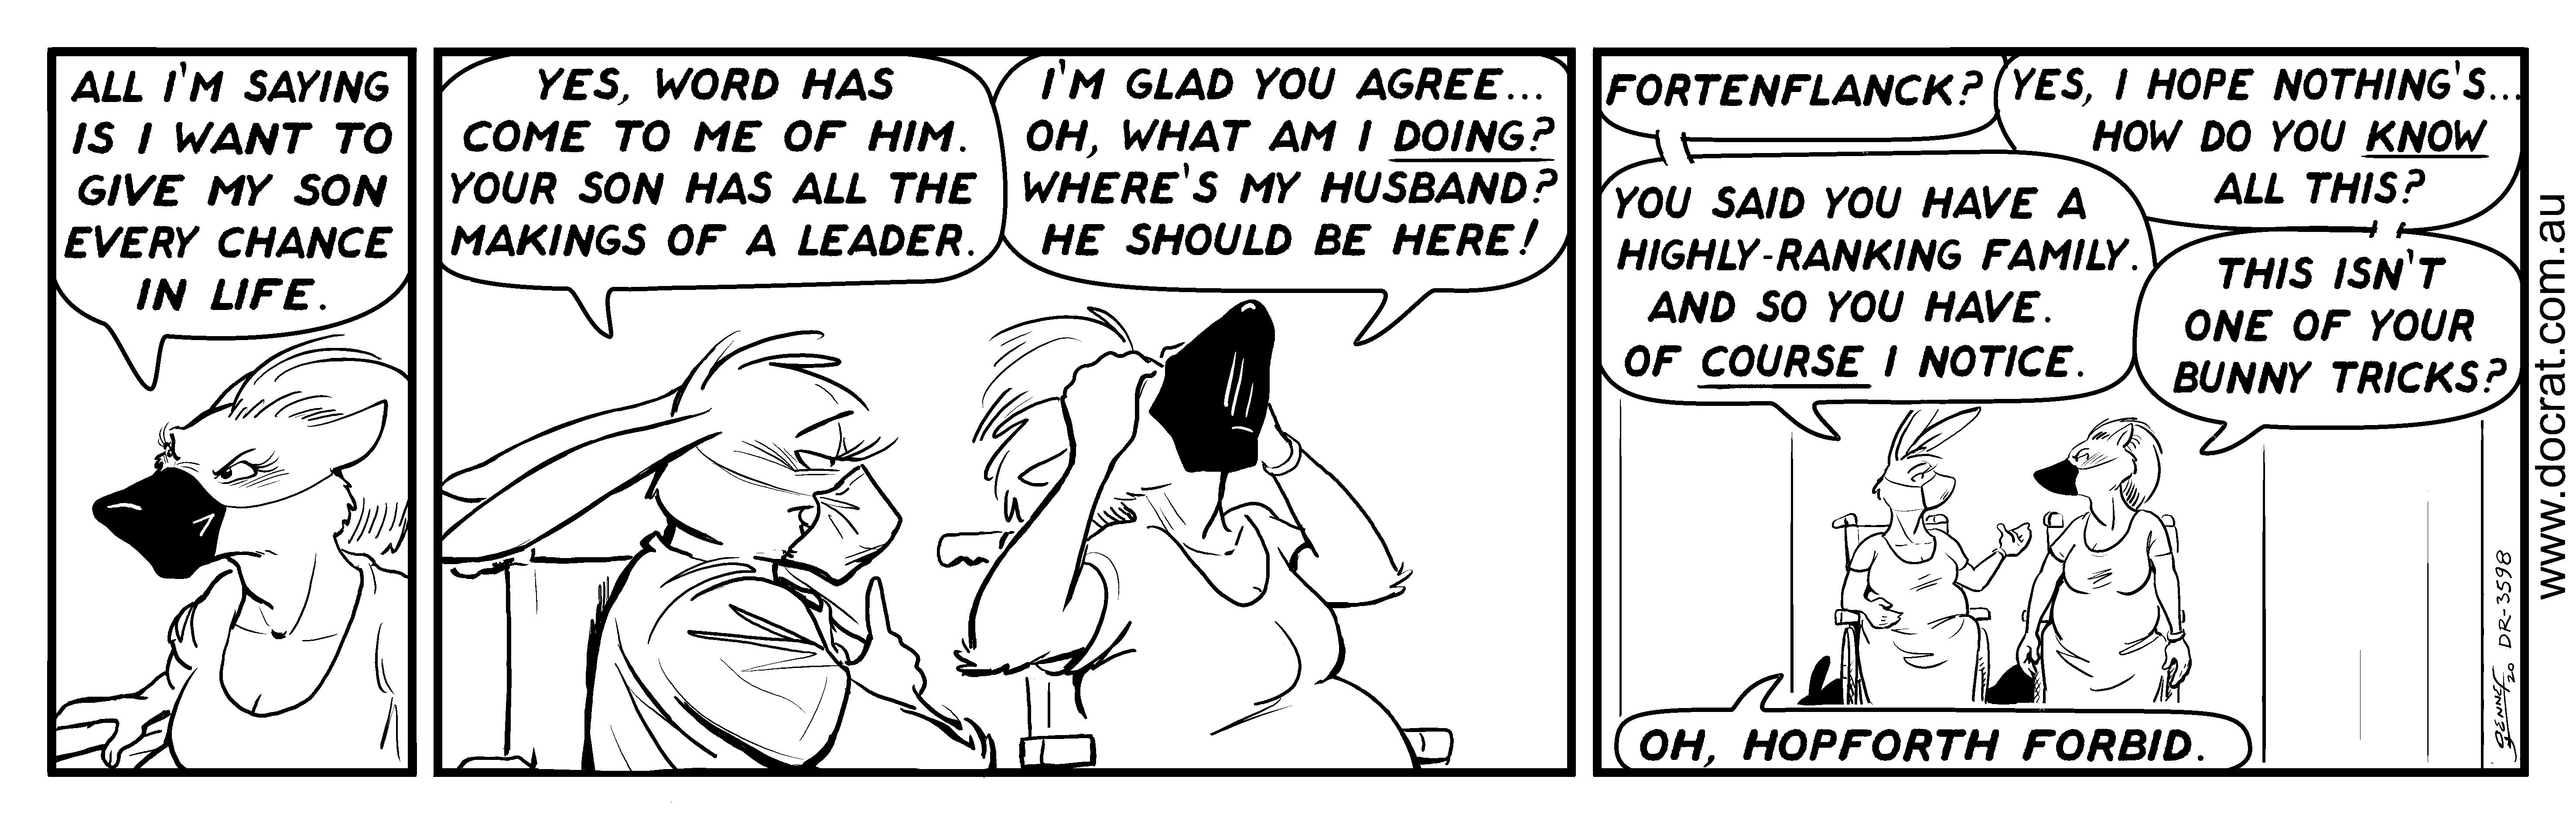 20201028